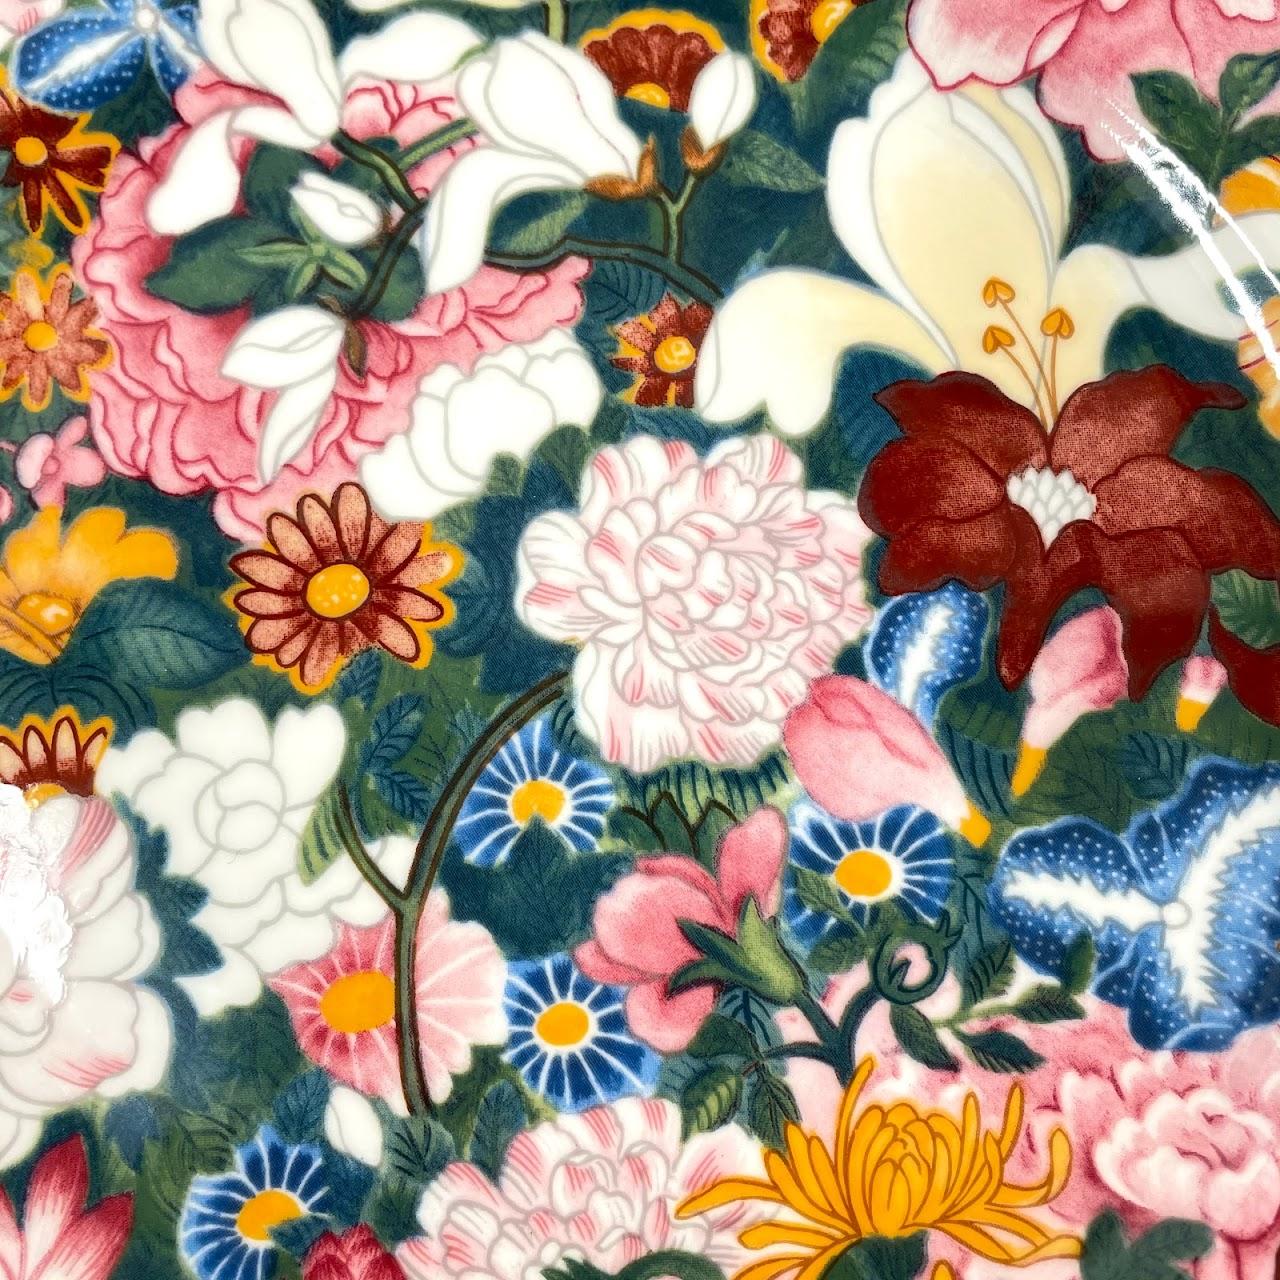 Wedgwood Ralph Lauren Imperial Garden Dinner Plates